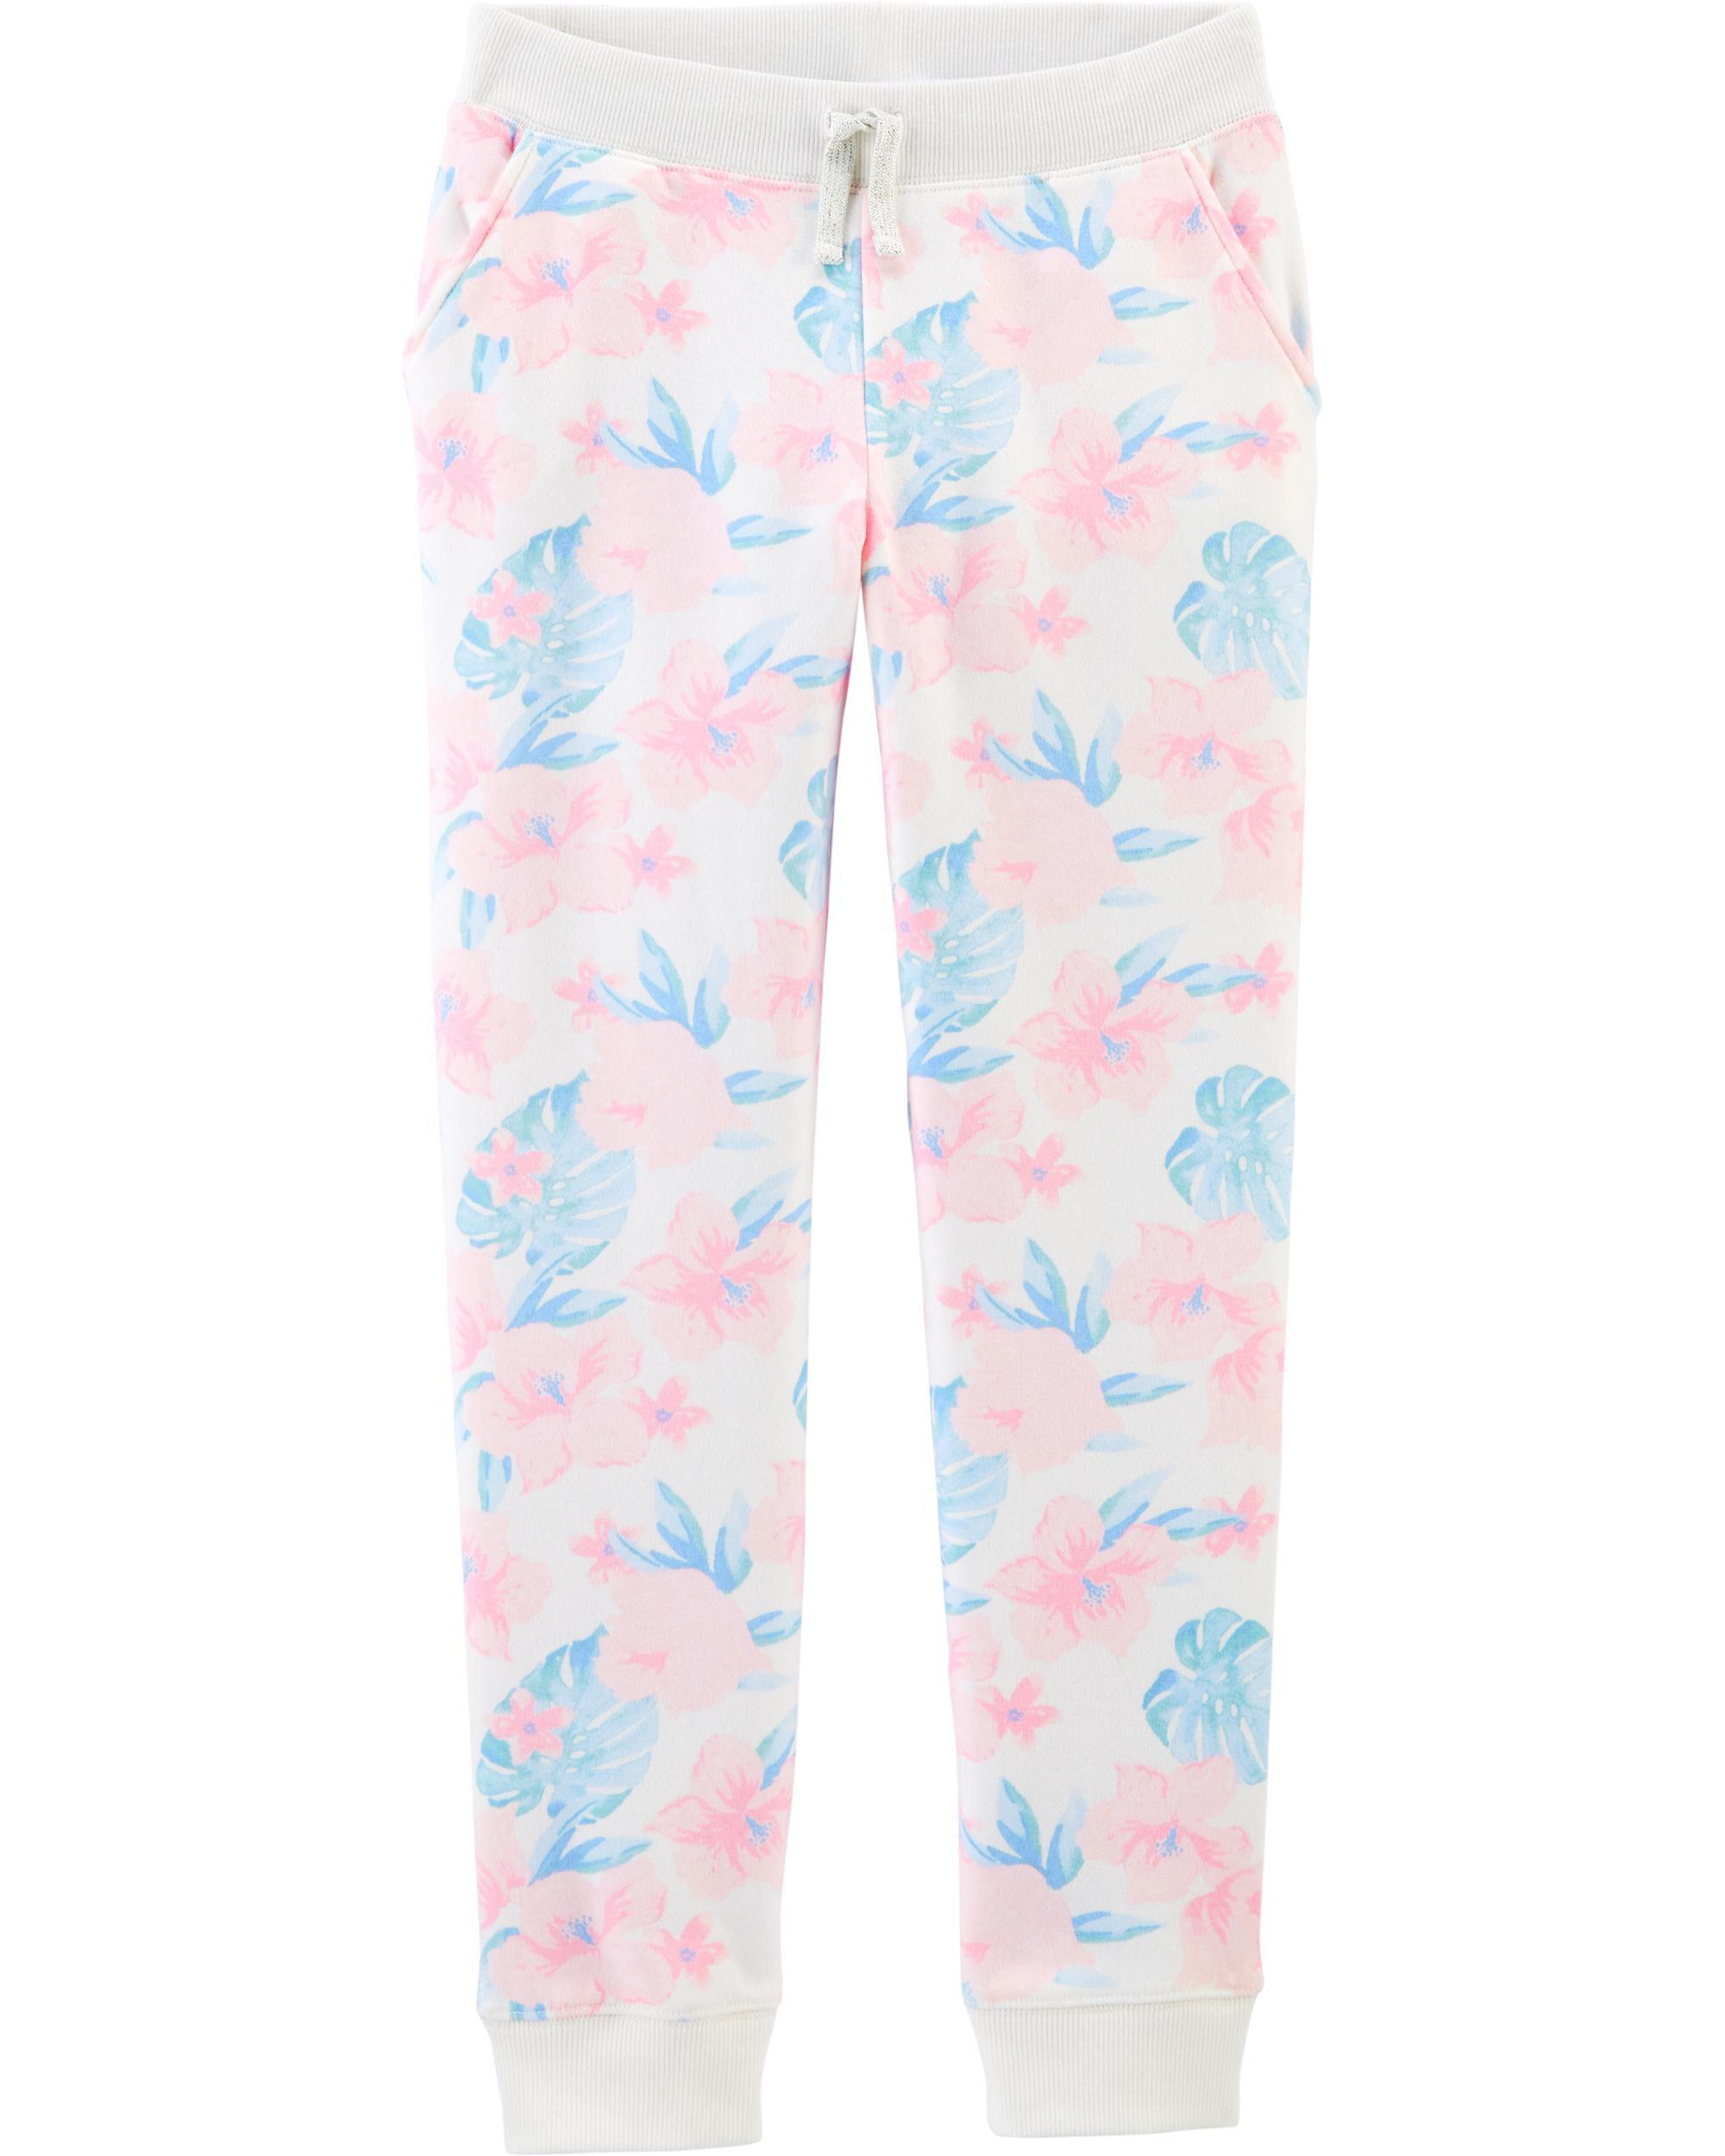 *CLEARANCE*Tropical Floral Fleece Pants